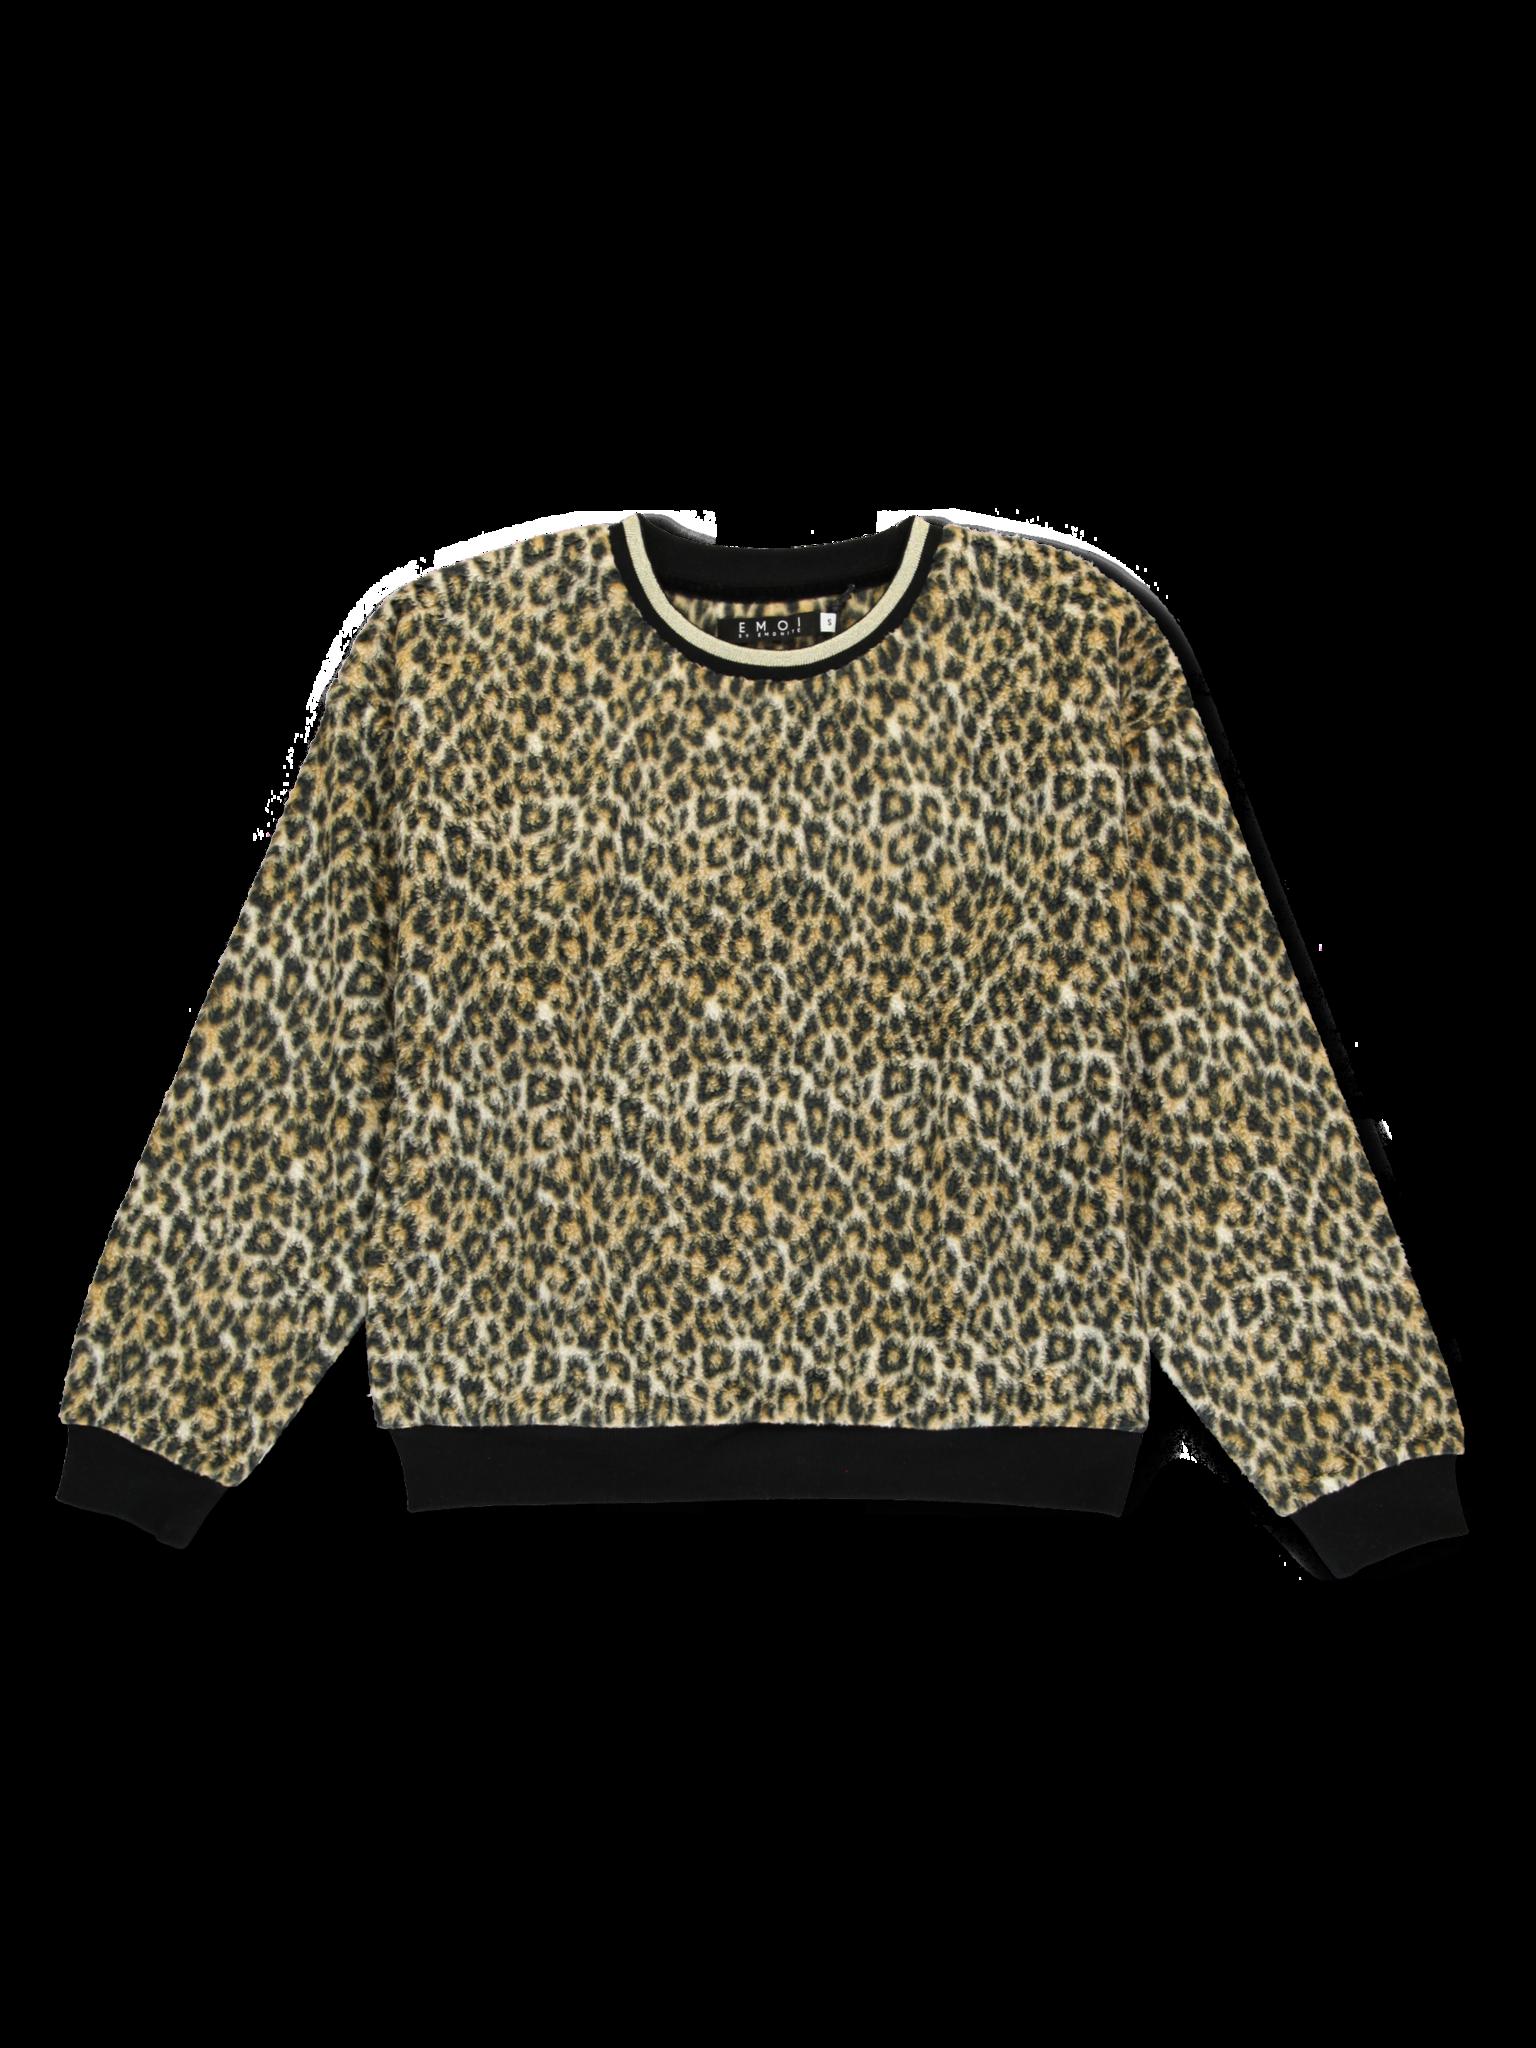 All Brands | Winterproducts Ladies | Sweatshirt | 10 pcs/box